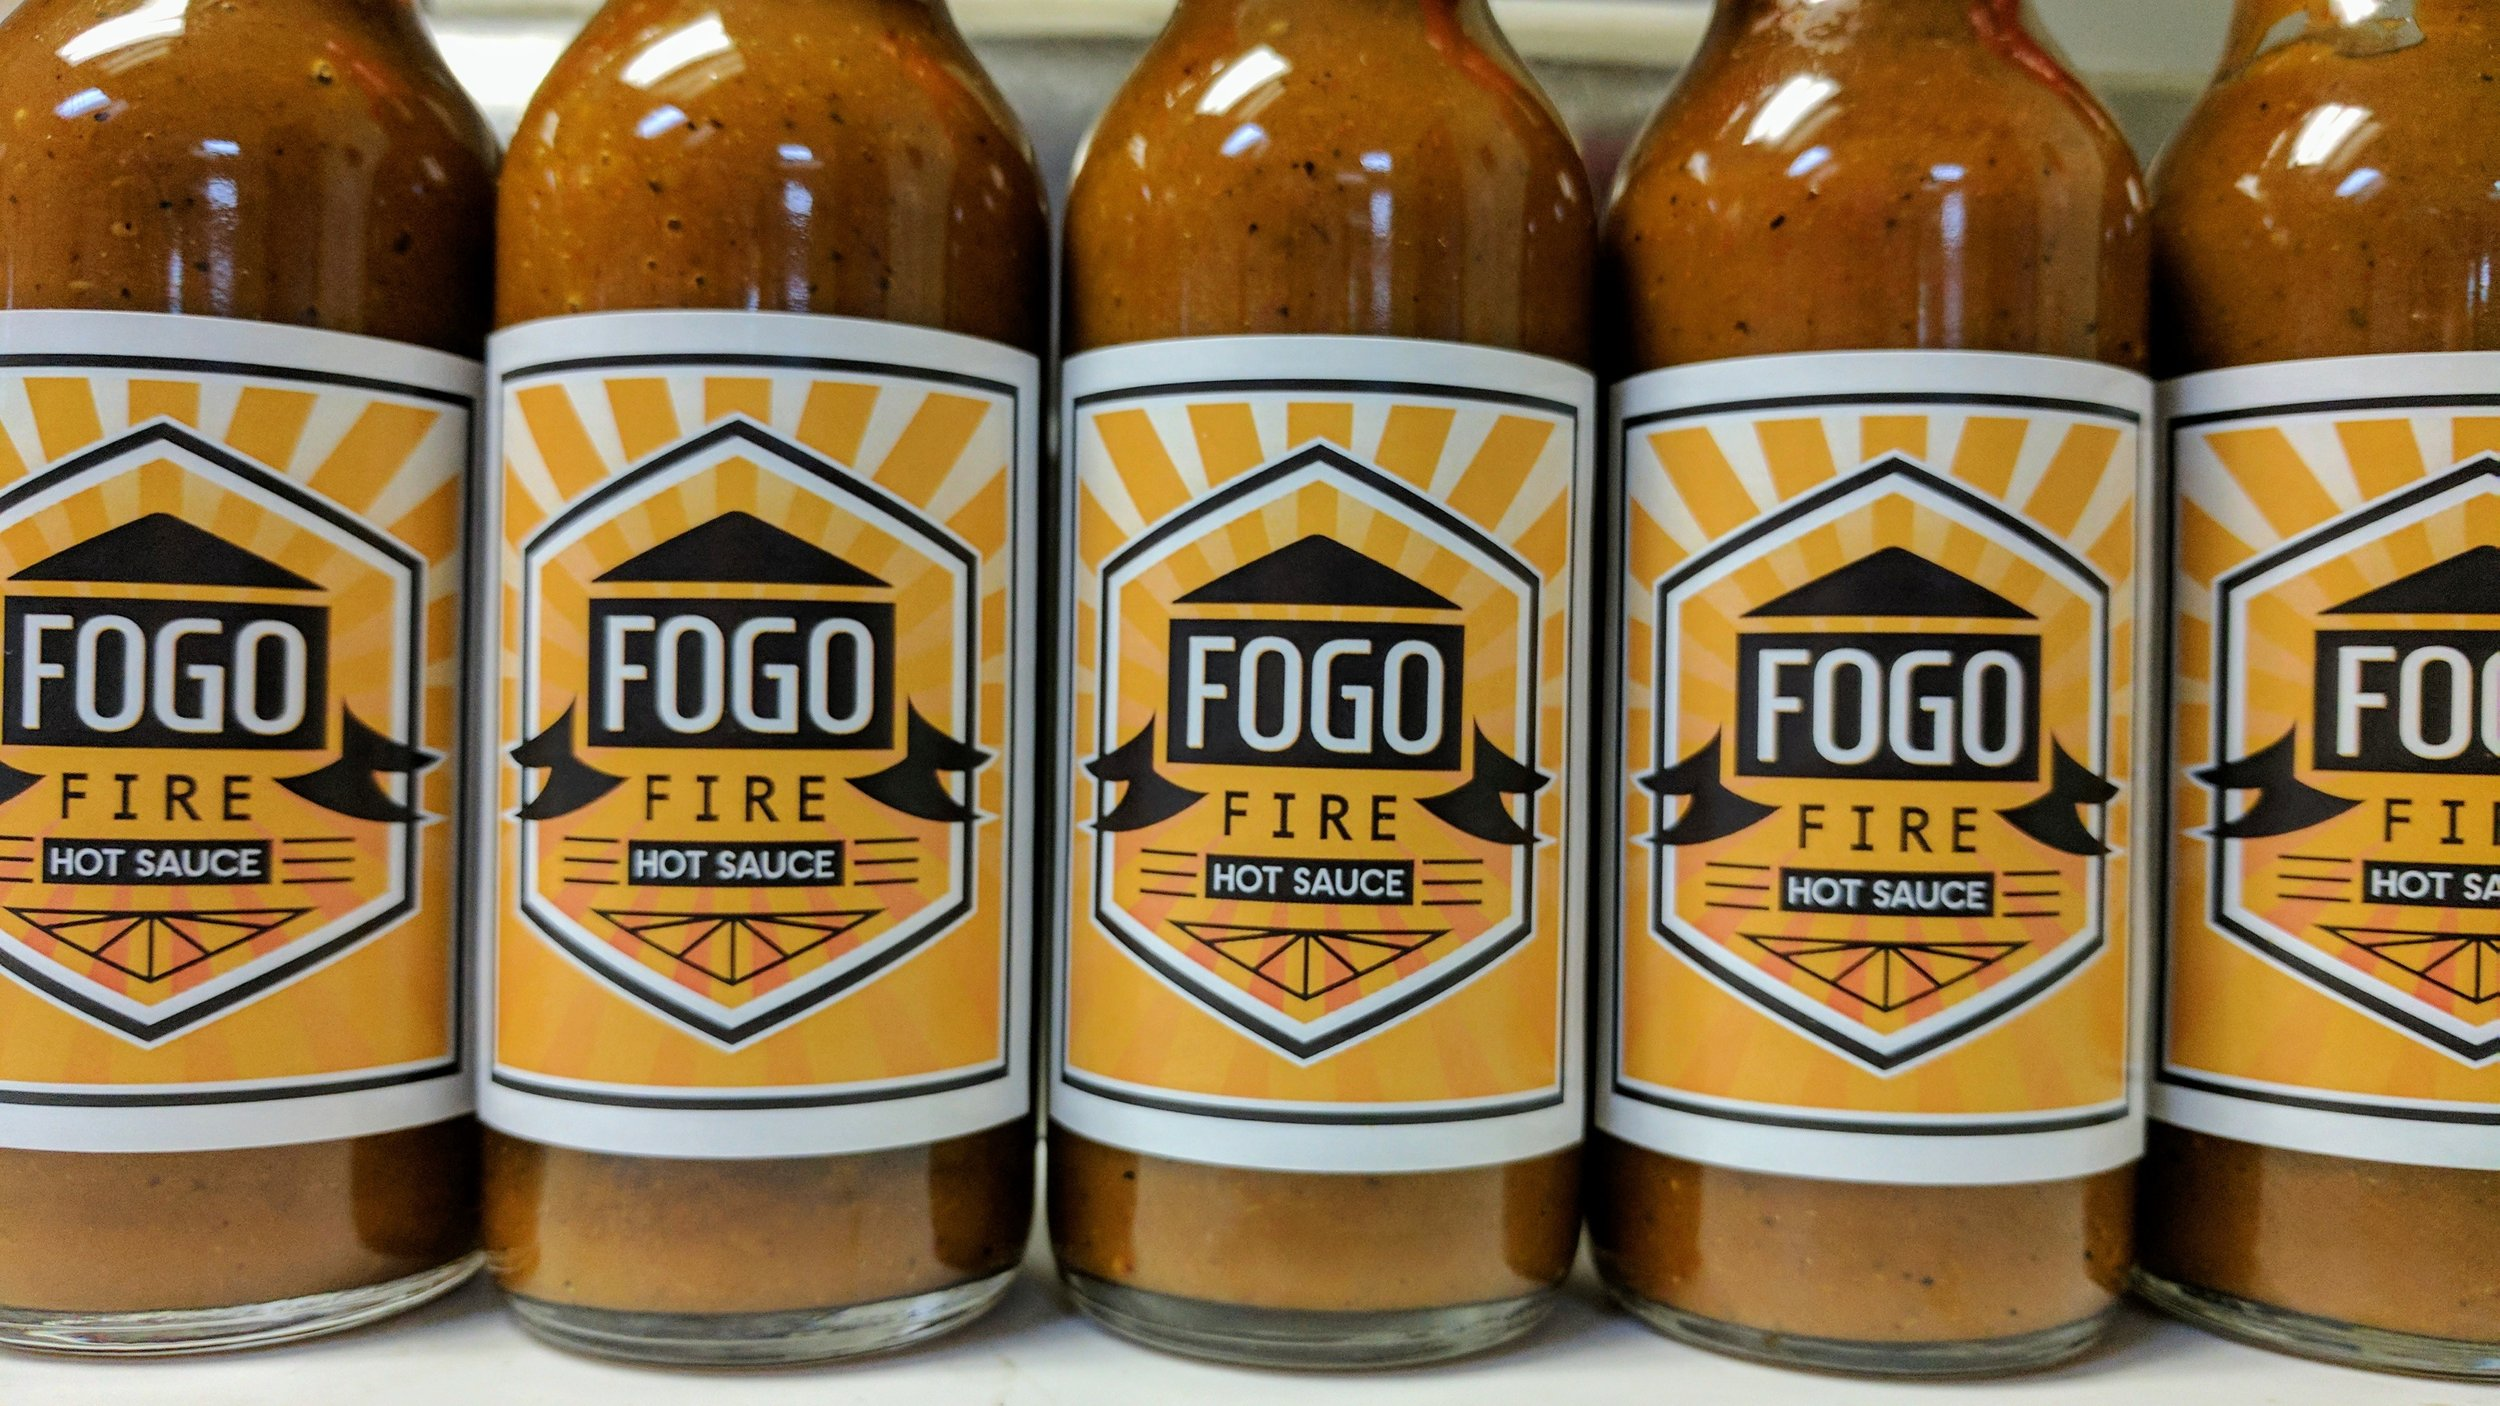 Fogo Fire.jpg